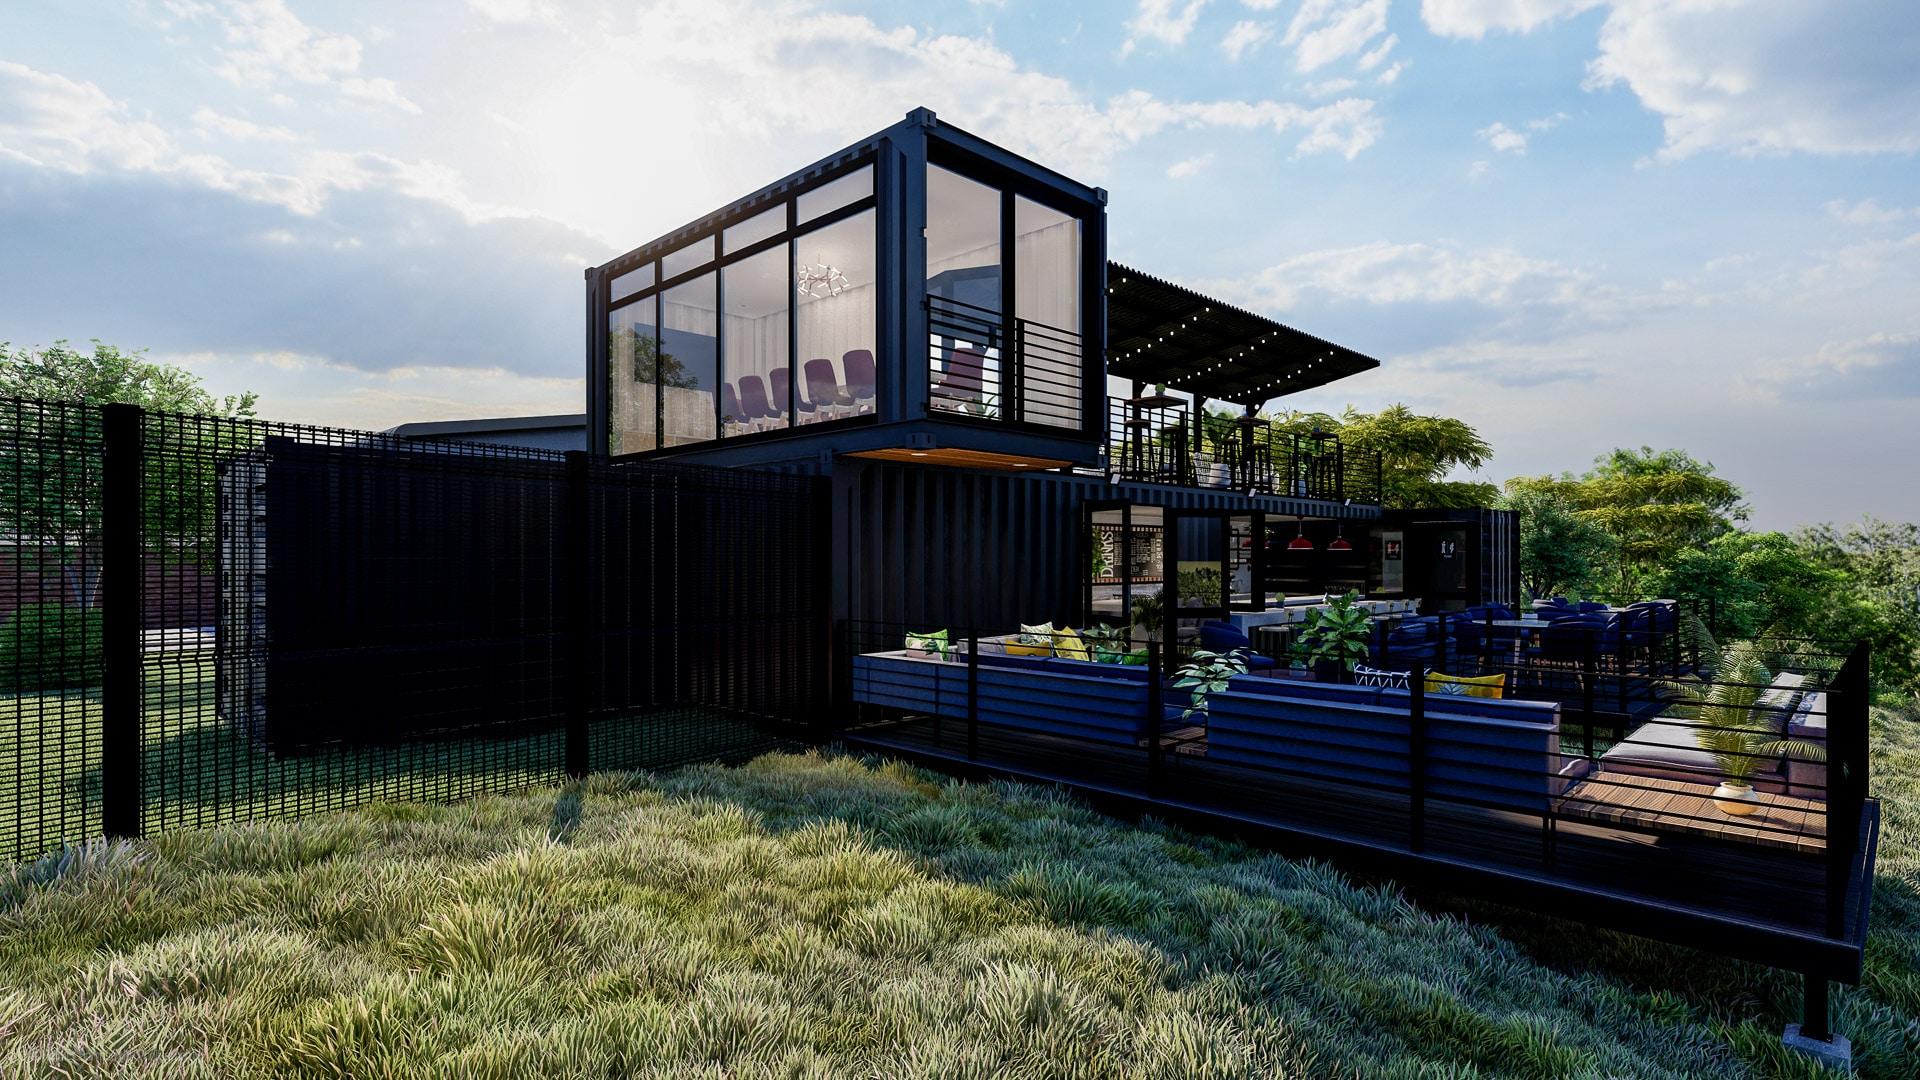 RHPX_Portfolio_LVR Container Restaurant-4